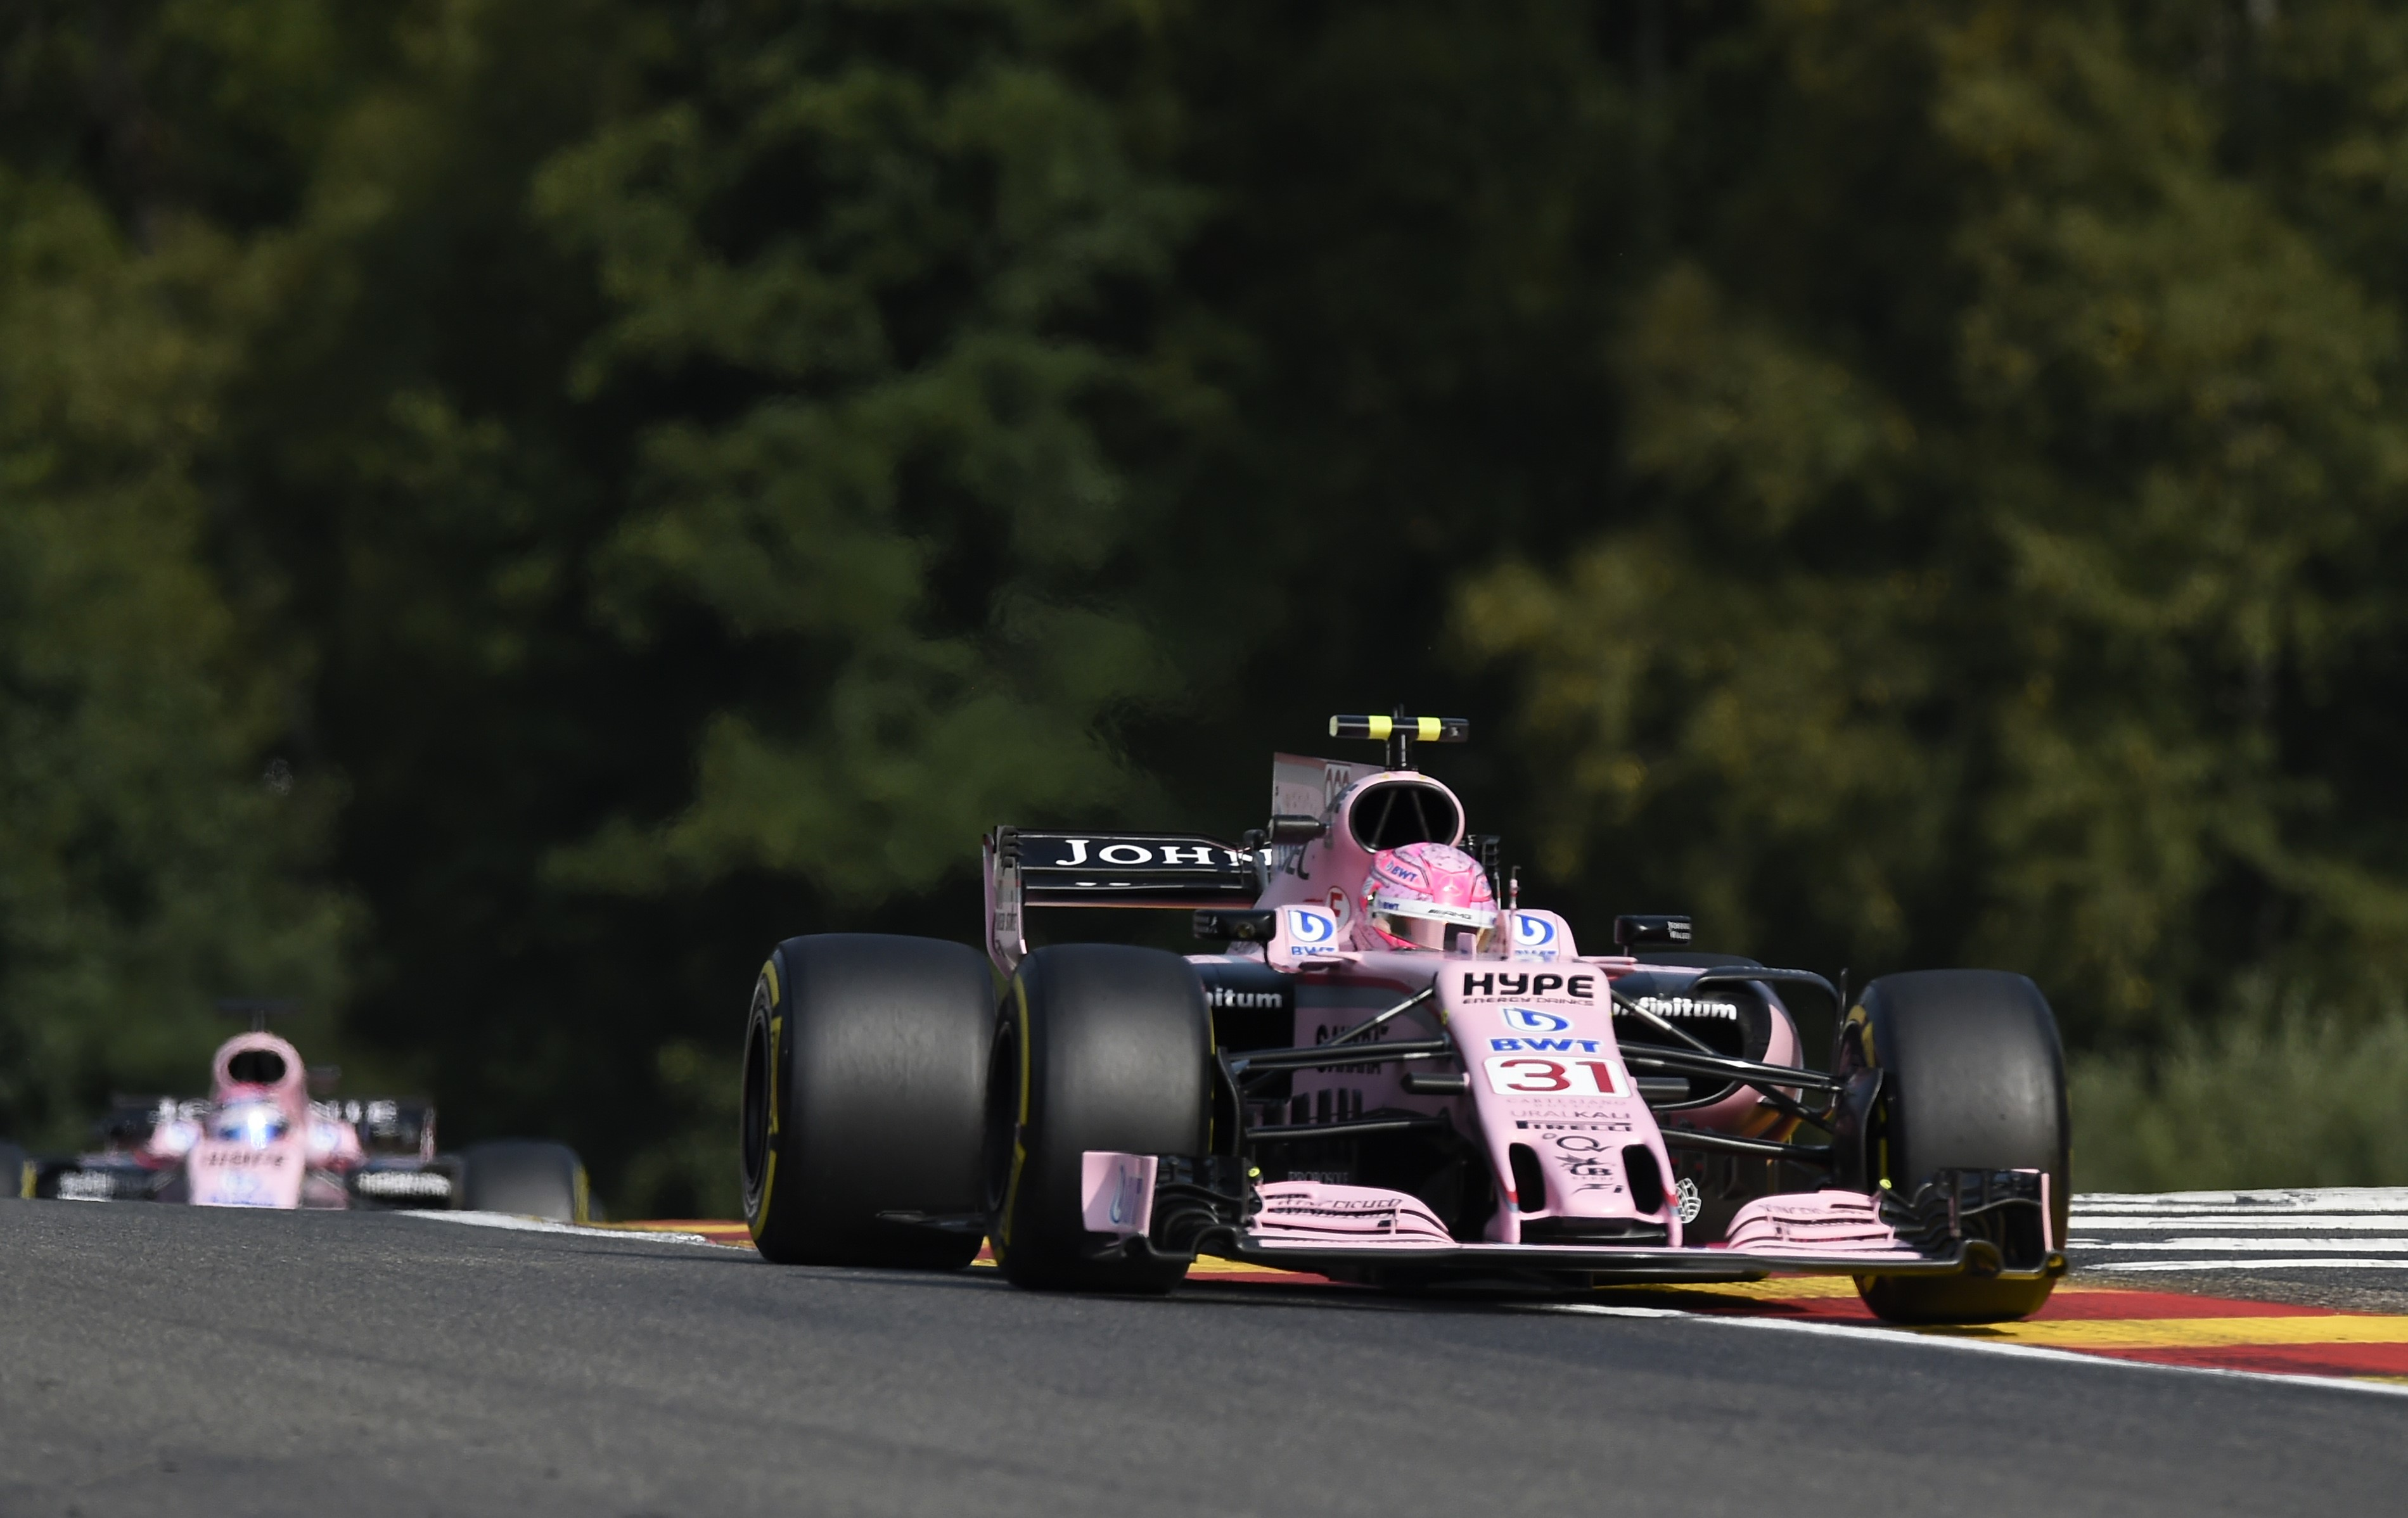 Esteban Ocon et Sergio Pérez (Force India)  au Grand Prix de Belgique 2017